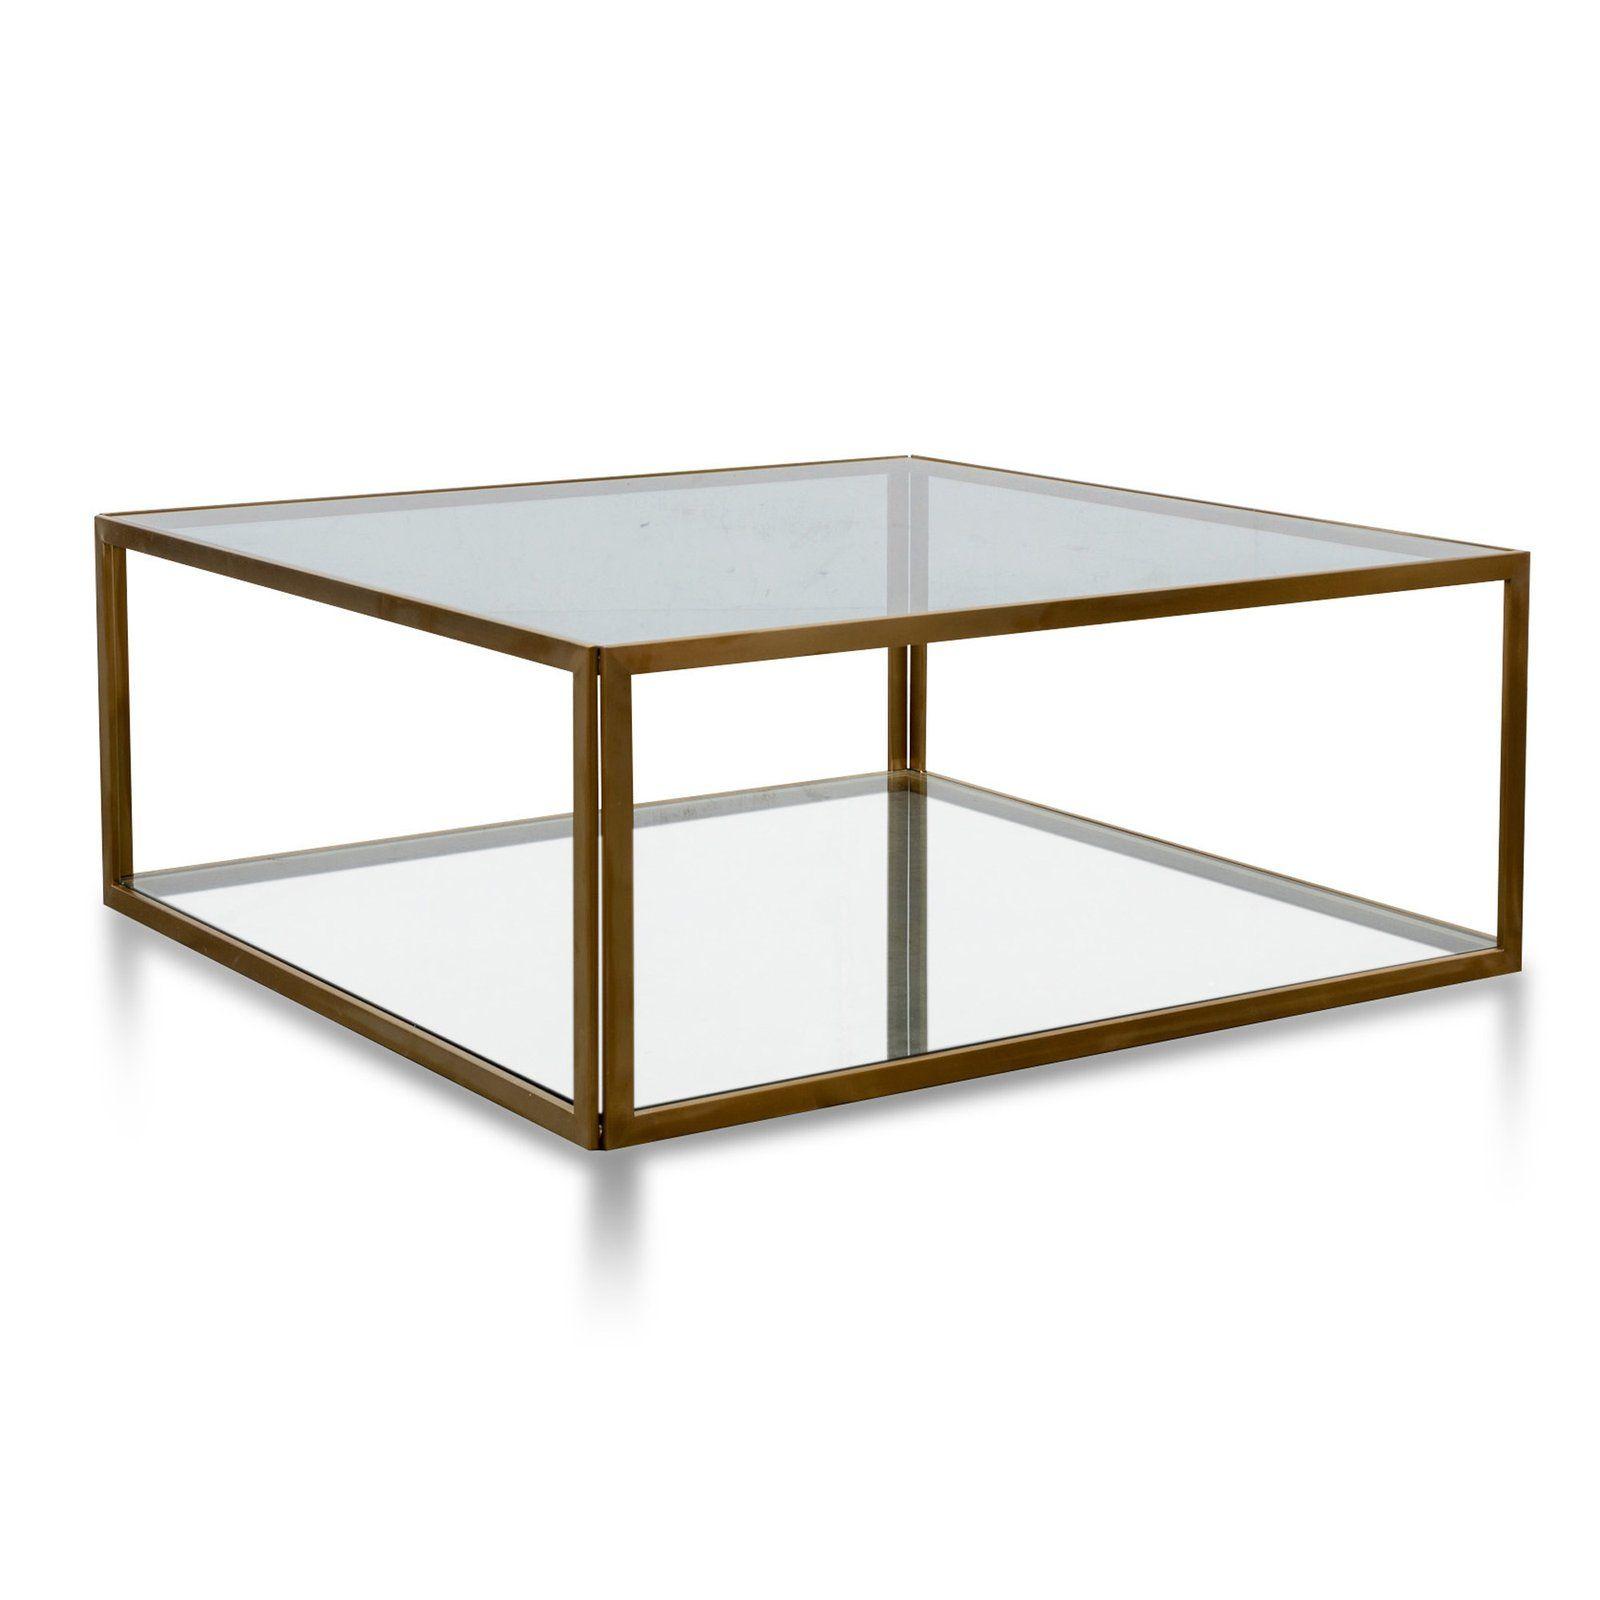 Ccf2878 Ks 1m Glass Coffee Table Gold Base Calibre Furniture Coffee Table Gold Coffee Table Glass Coffee Table [ 1600 x 1600 Pixel ]